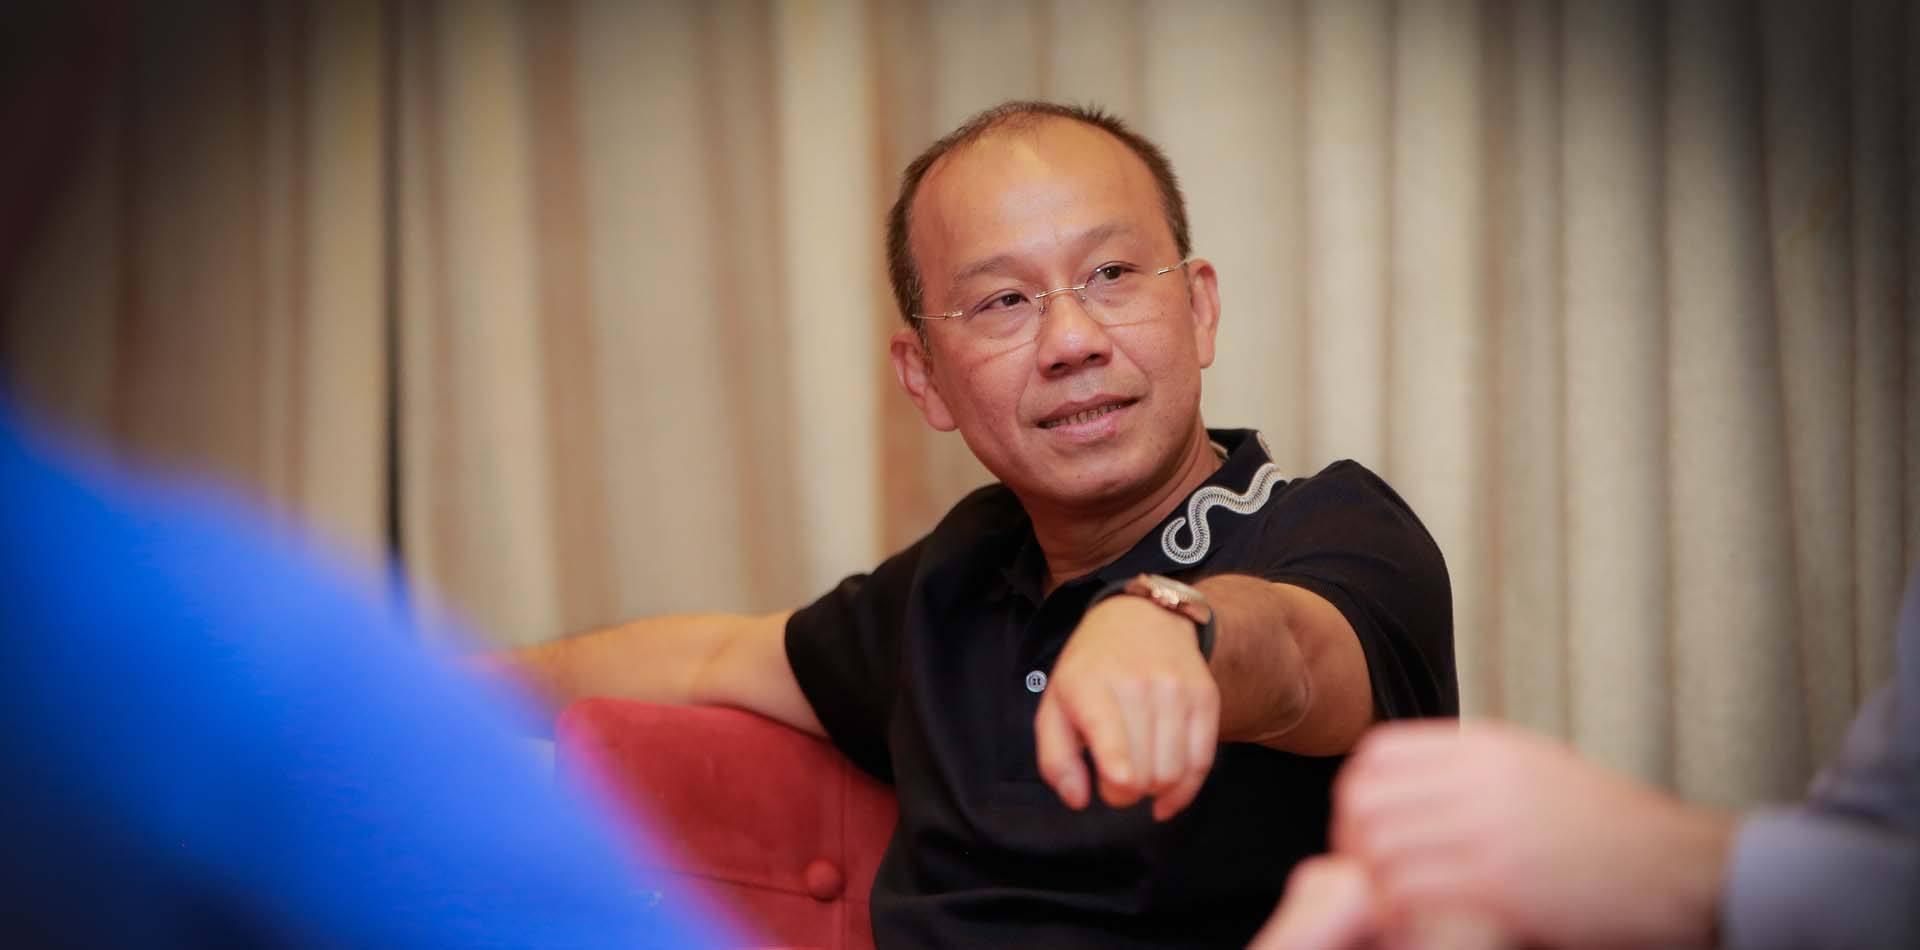 Paul Phua